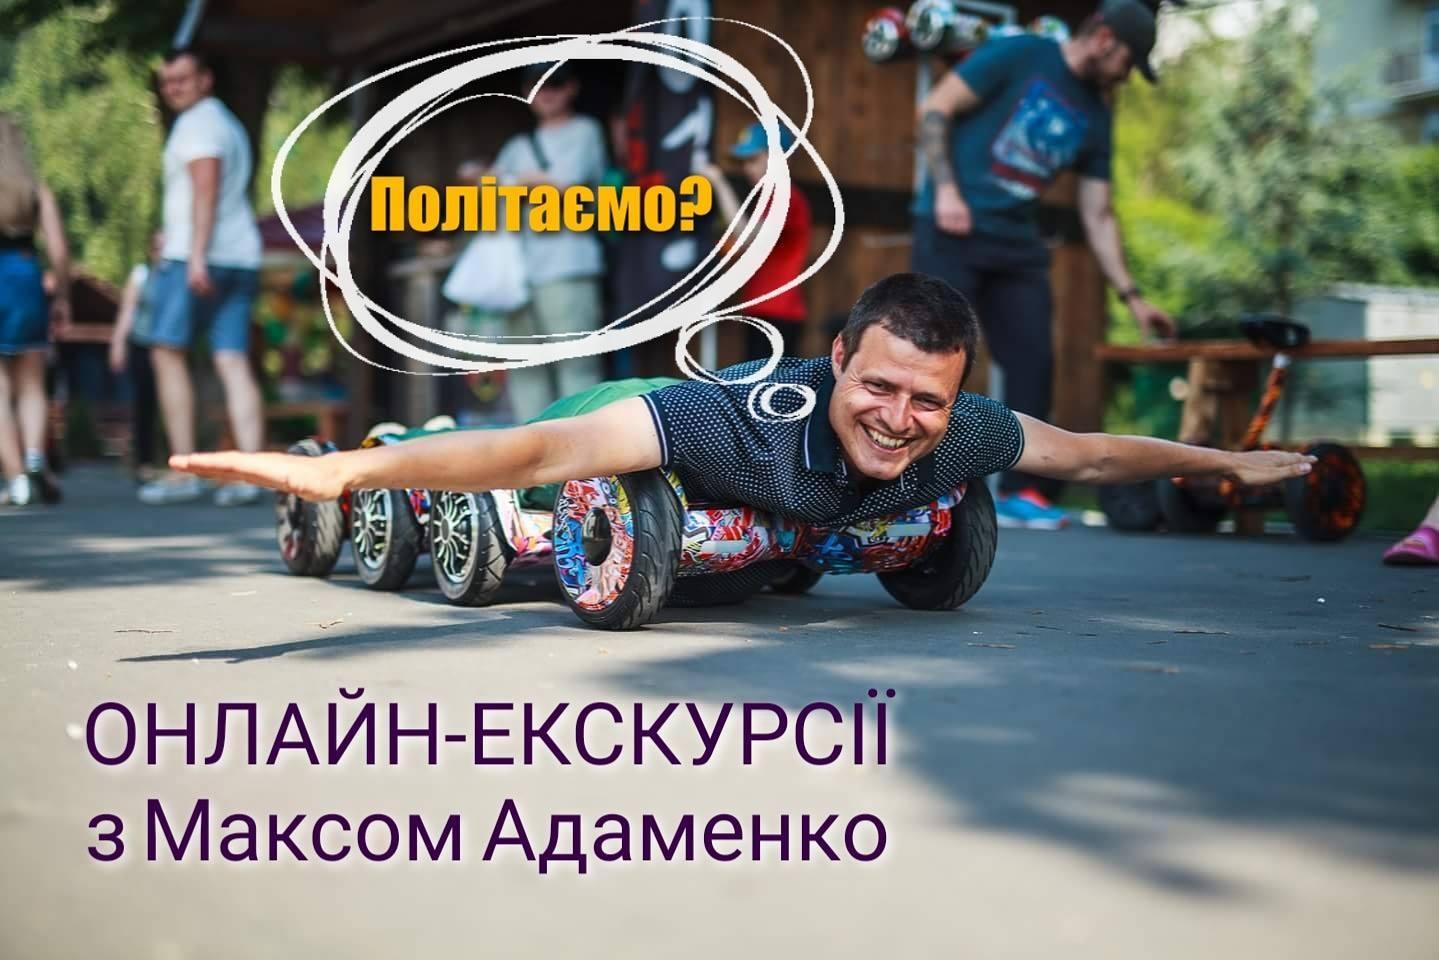 Максим Адаменко